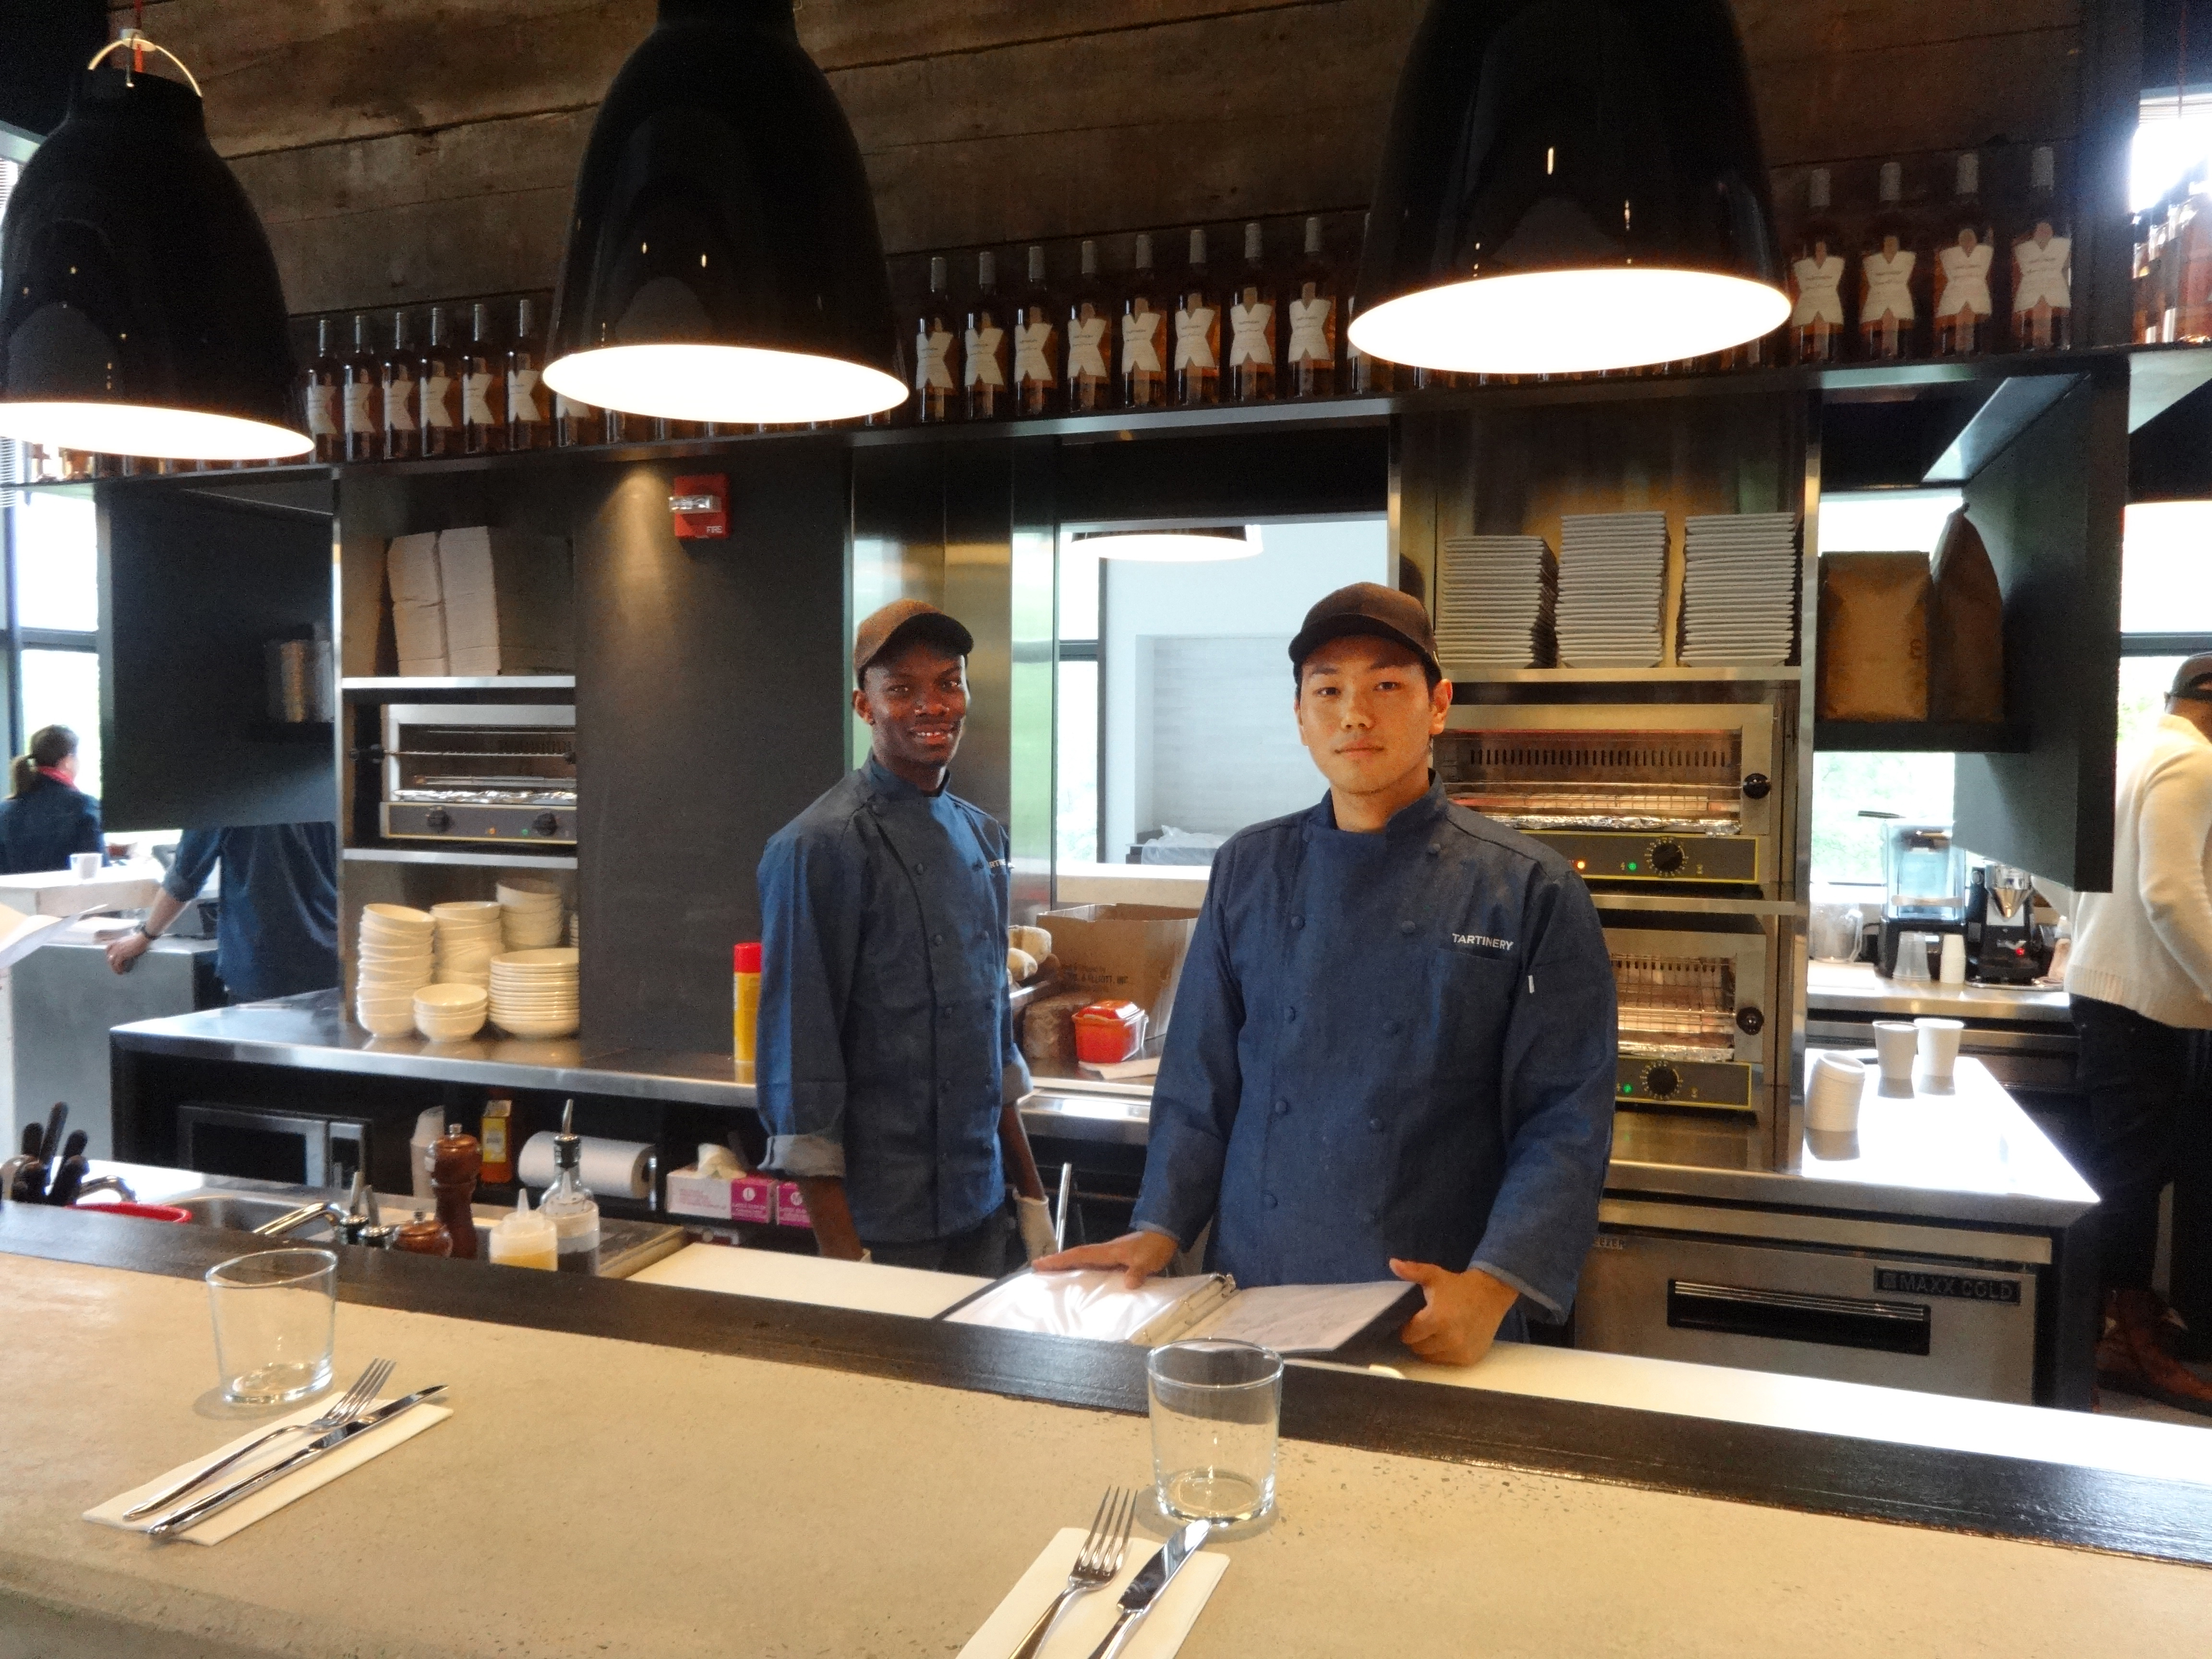 Tartinery staff PS